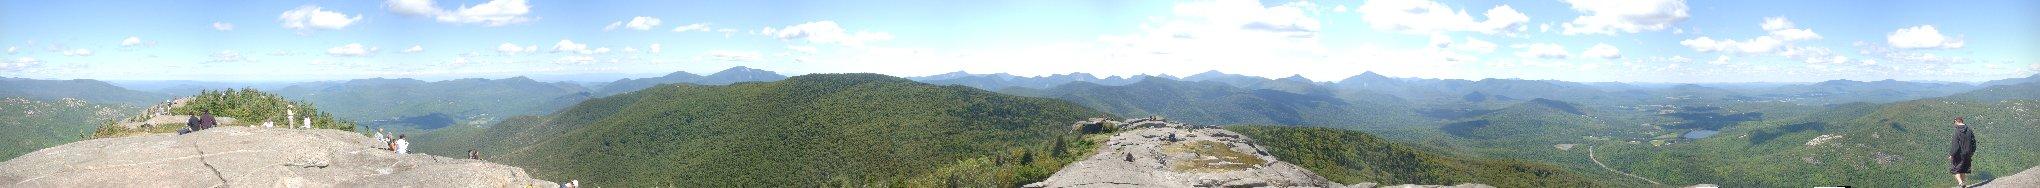 Vue du sommet de Cascade Mountain